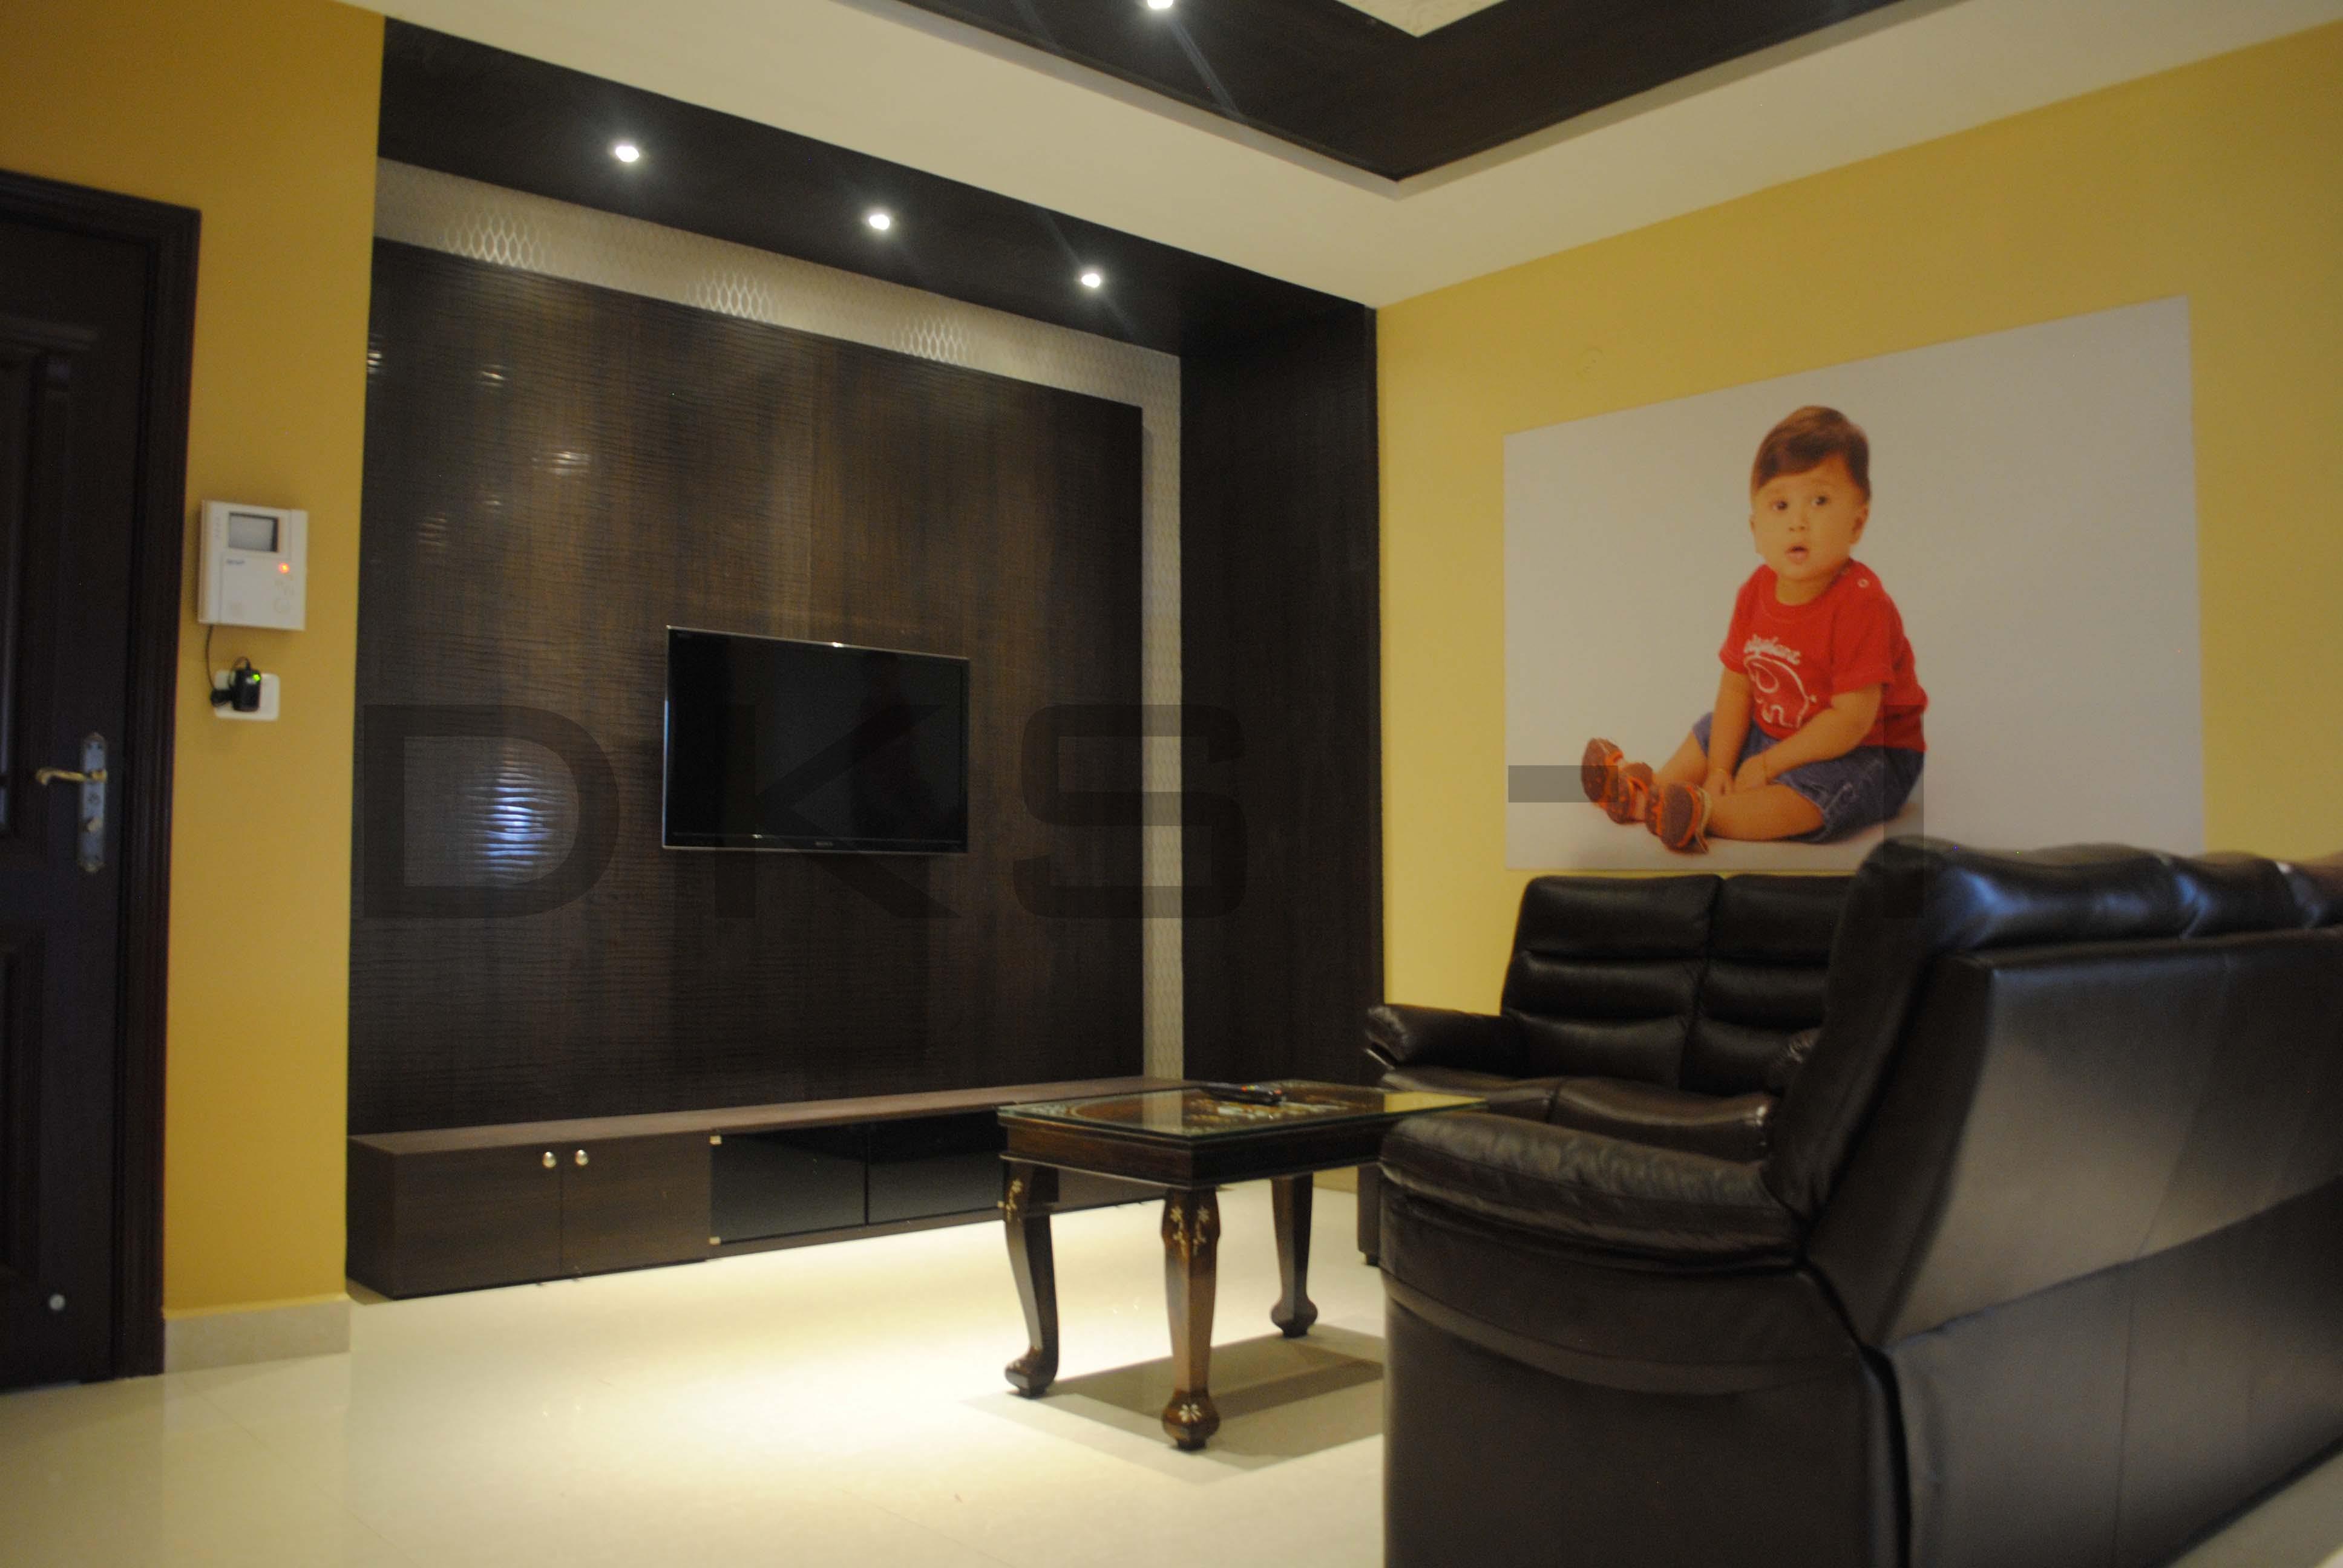 Living Room Designs Chennai residential interior design for mr.keerthivarman - bollineni